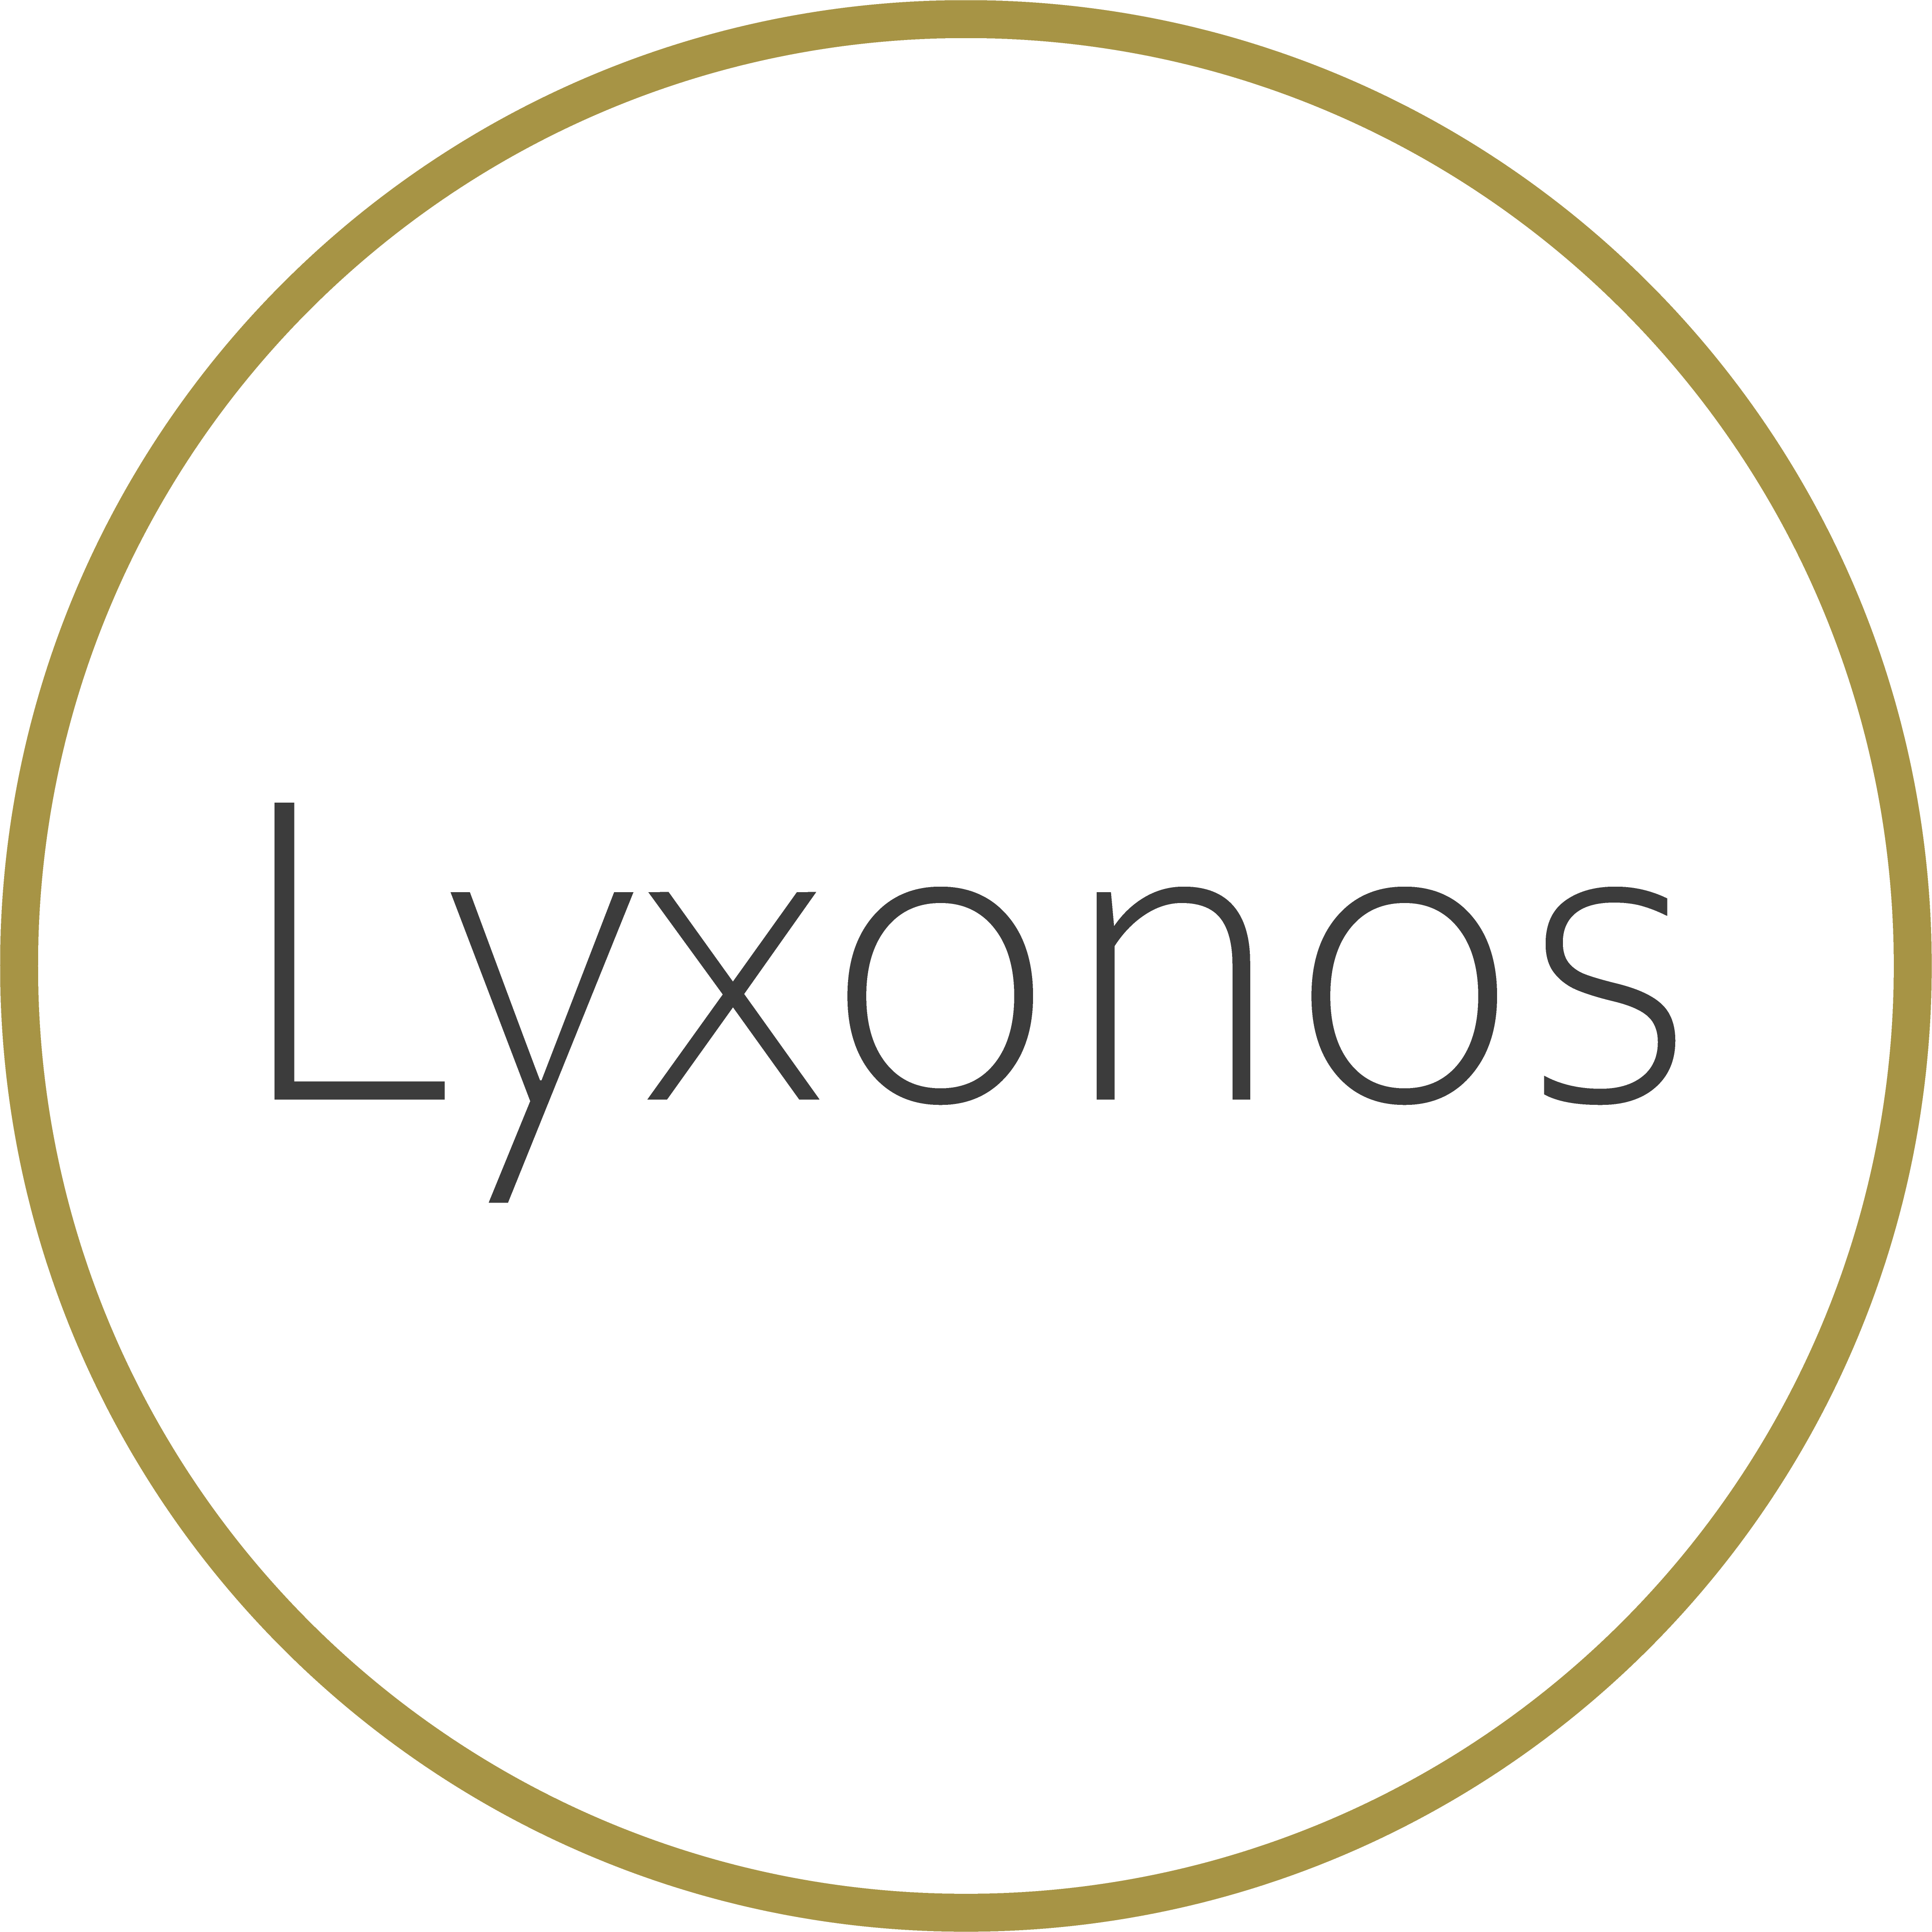 Lyxonos